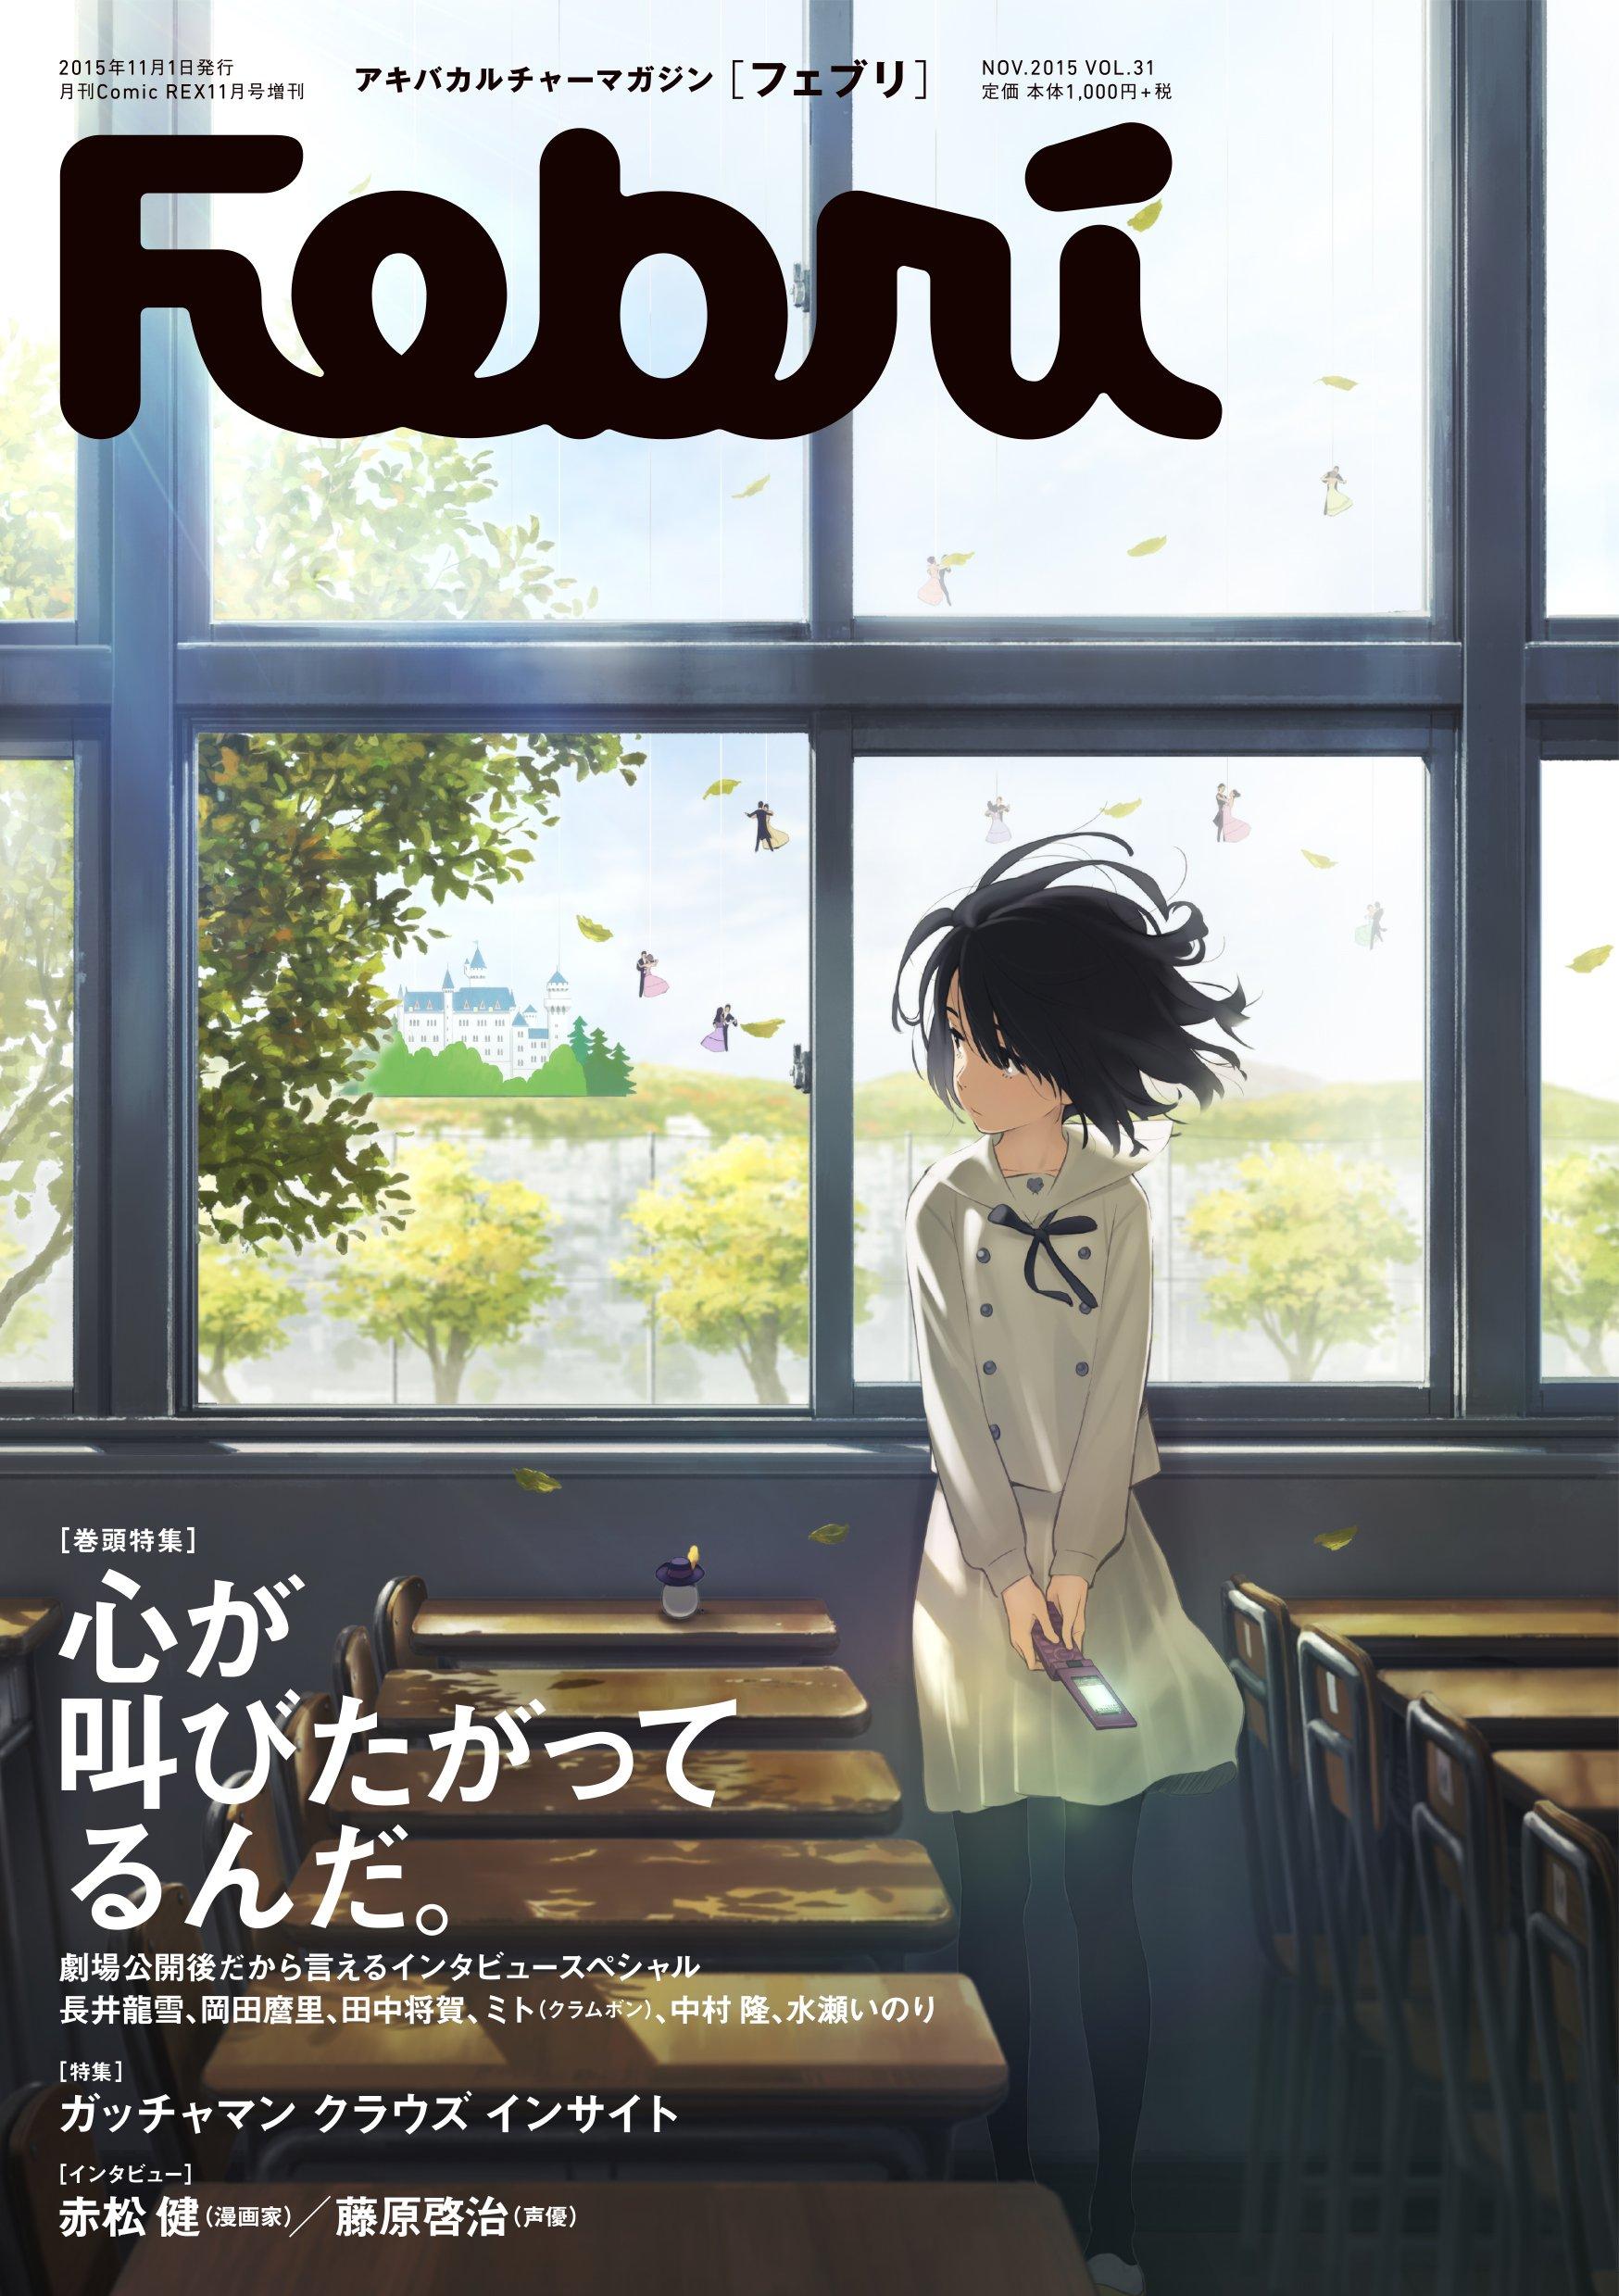 Febri (フェブリ) Vol.31 2015年 11月号